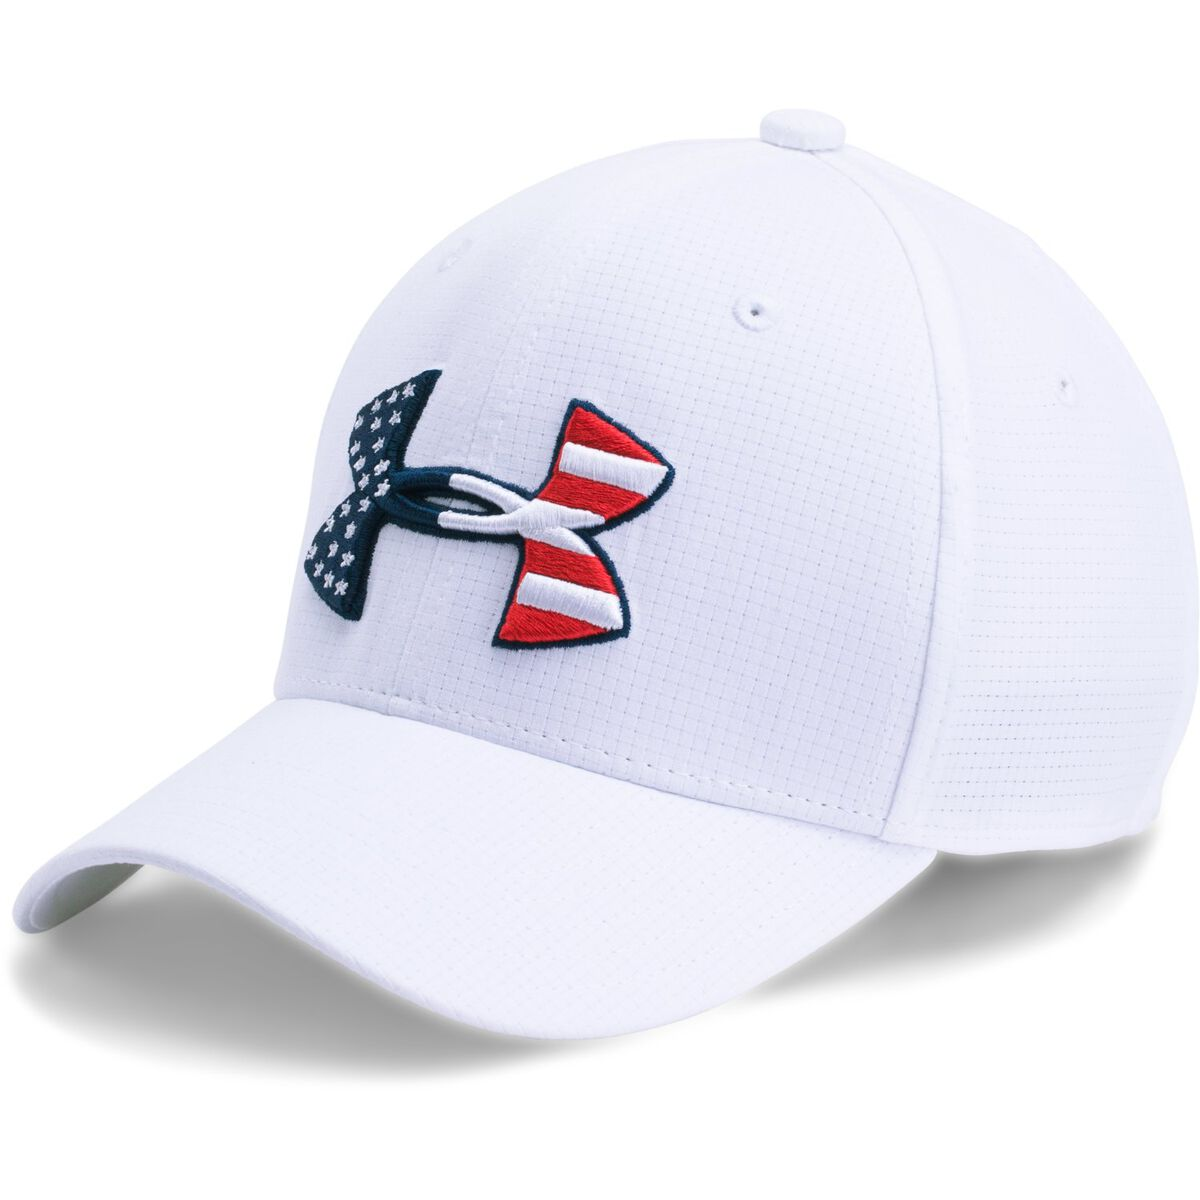 a4c9577f3a0 Images. Under Armour Boys Big Flag Logo 2.0 Hat